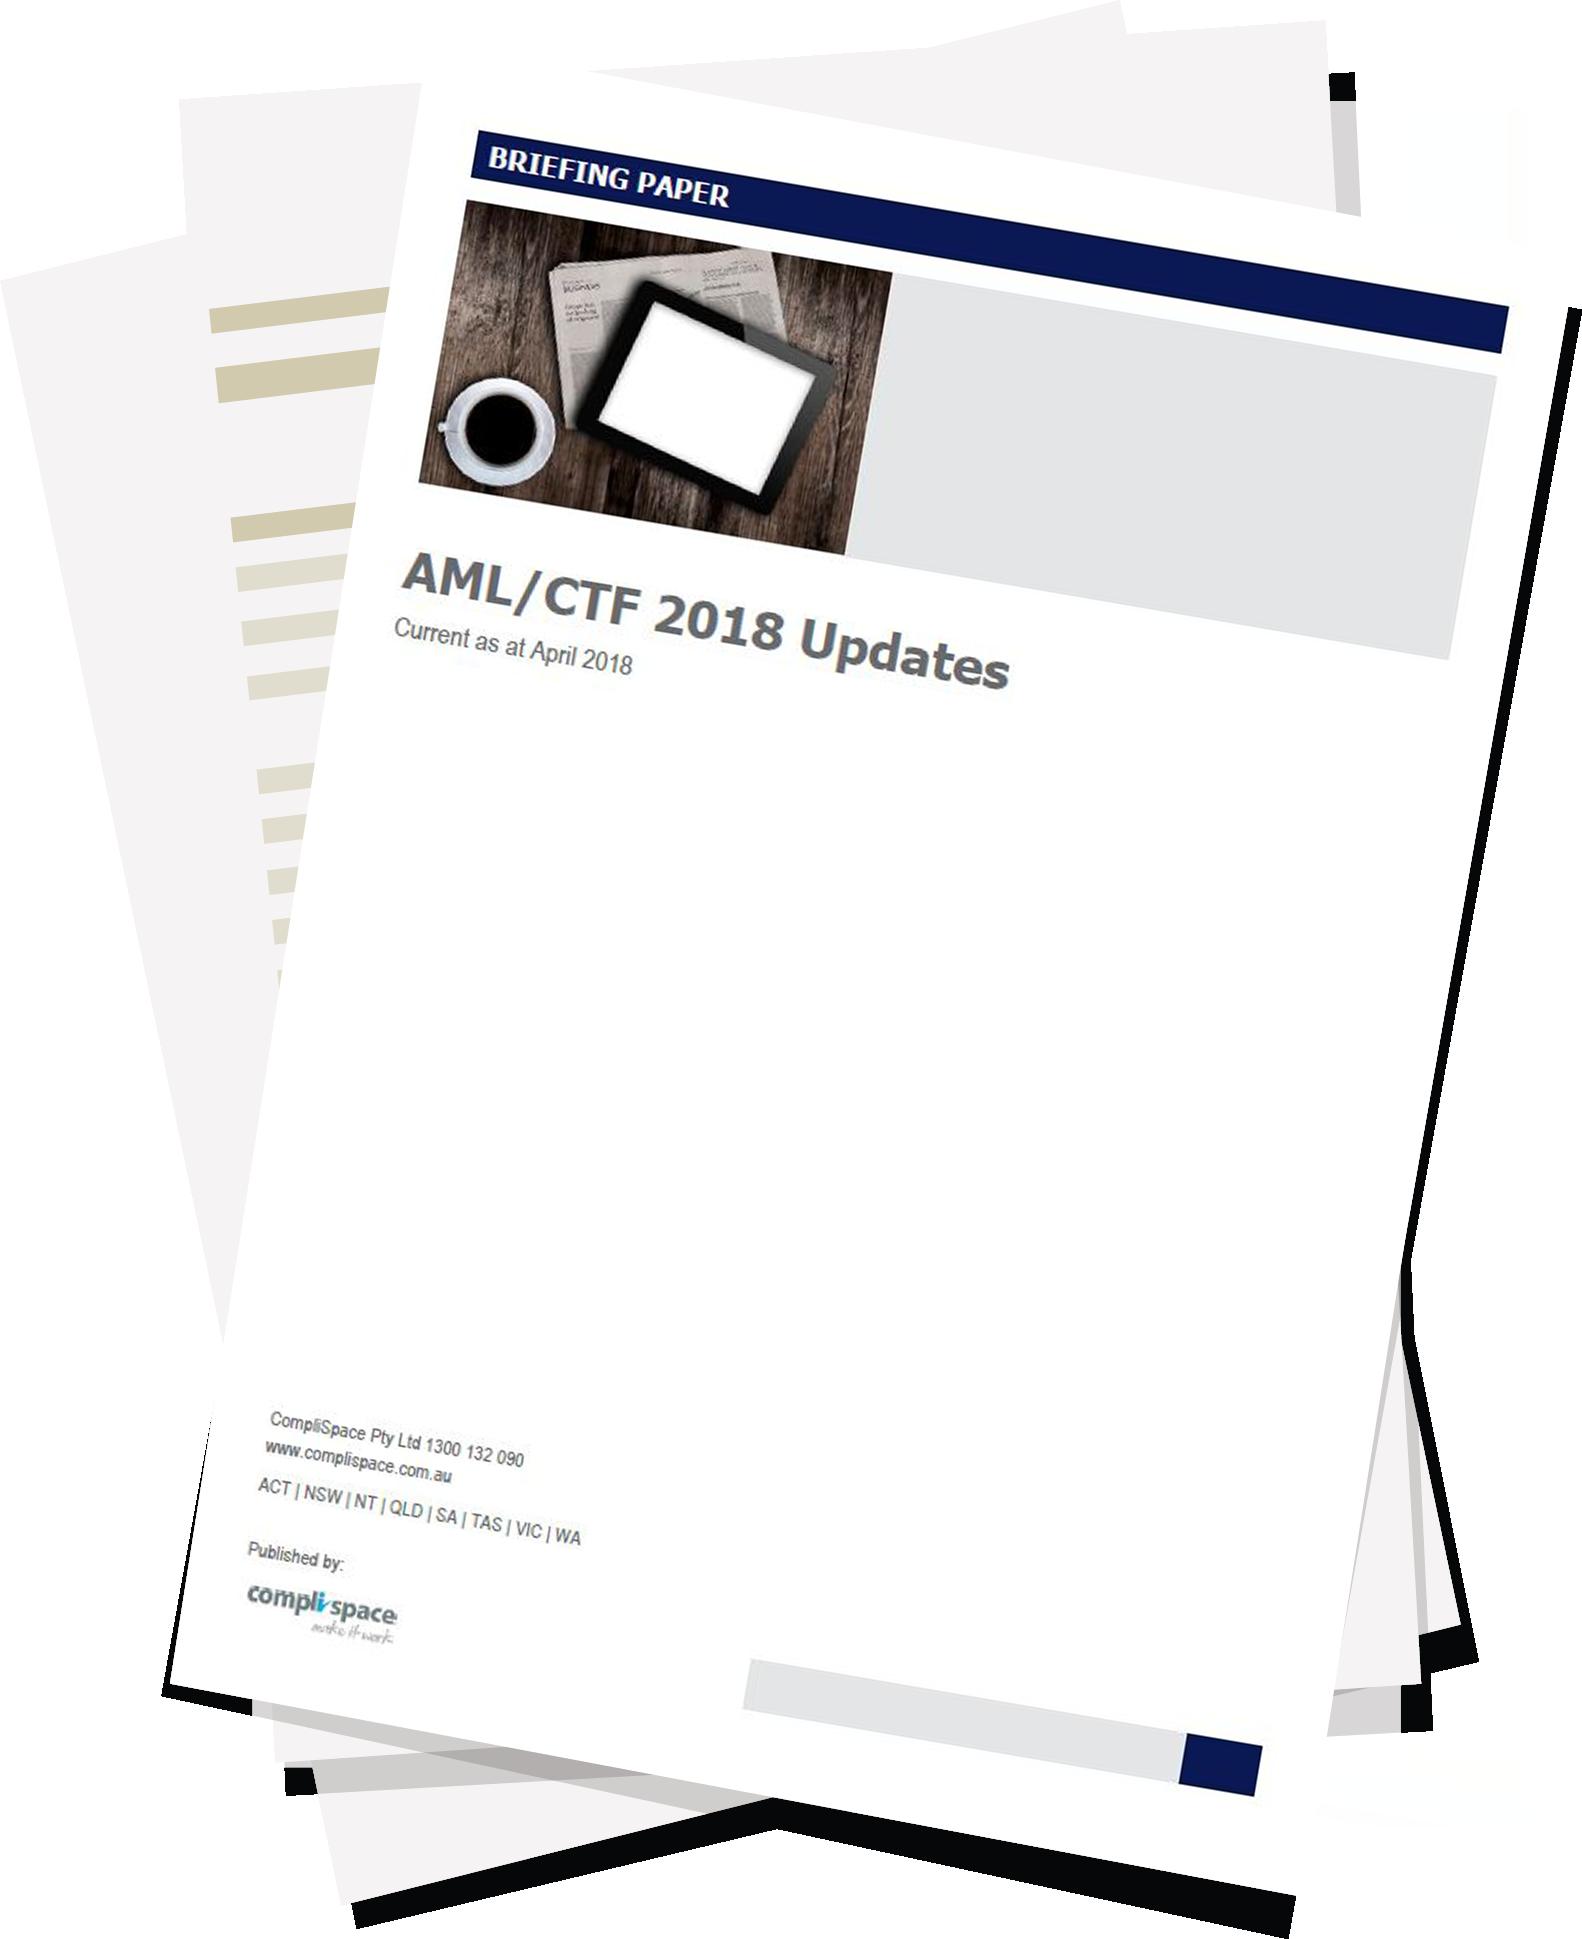 AML/CTF 2018 Updates